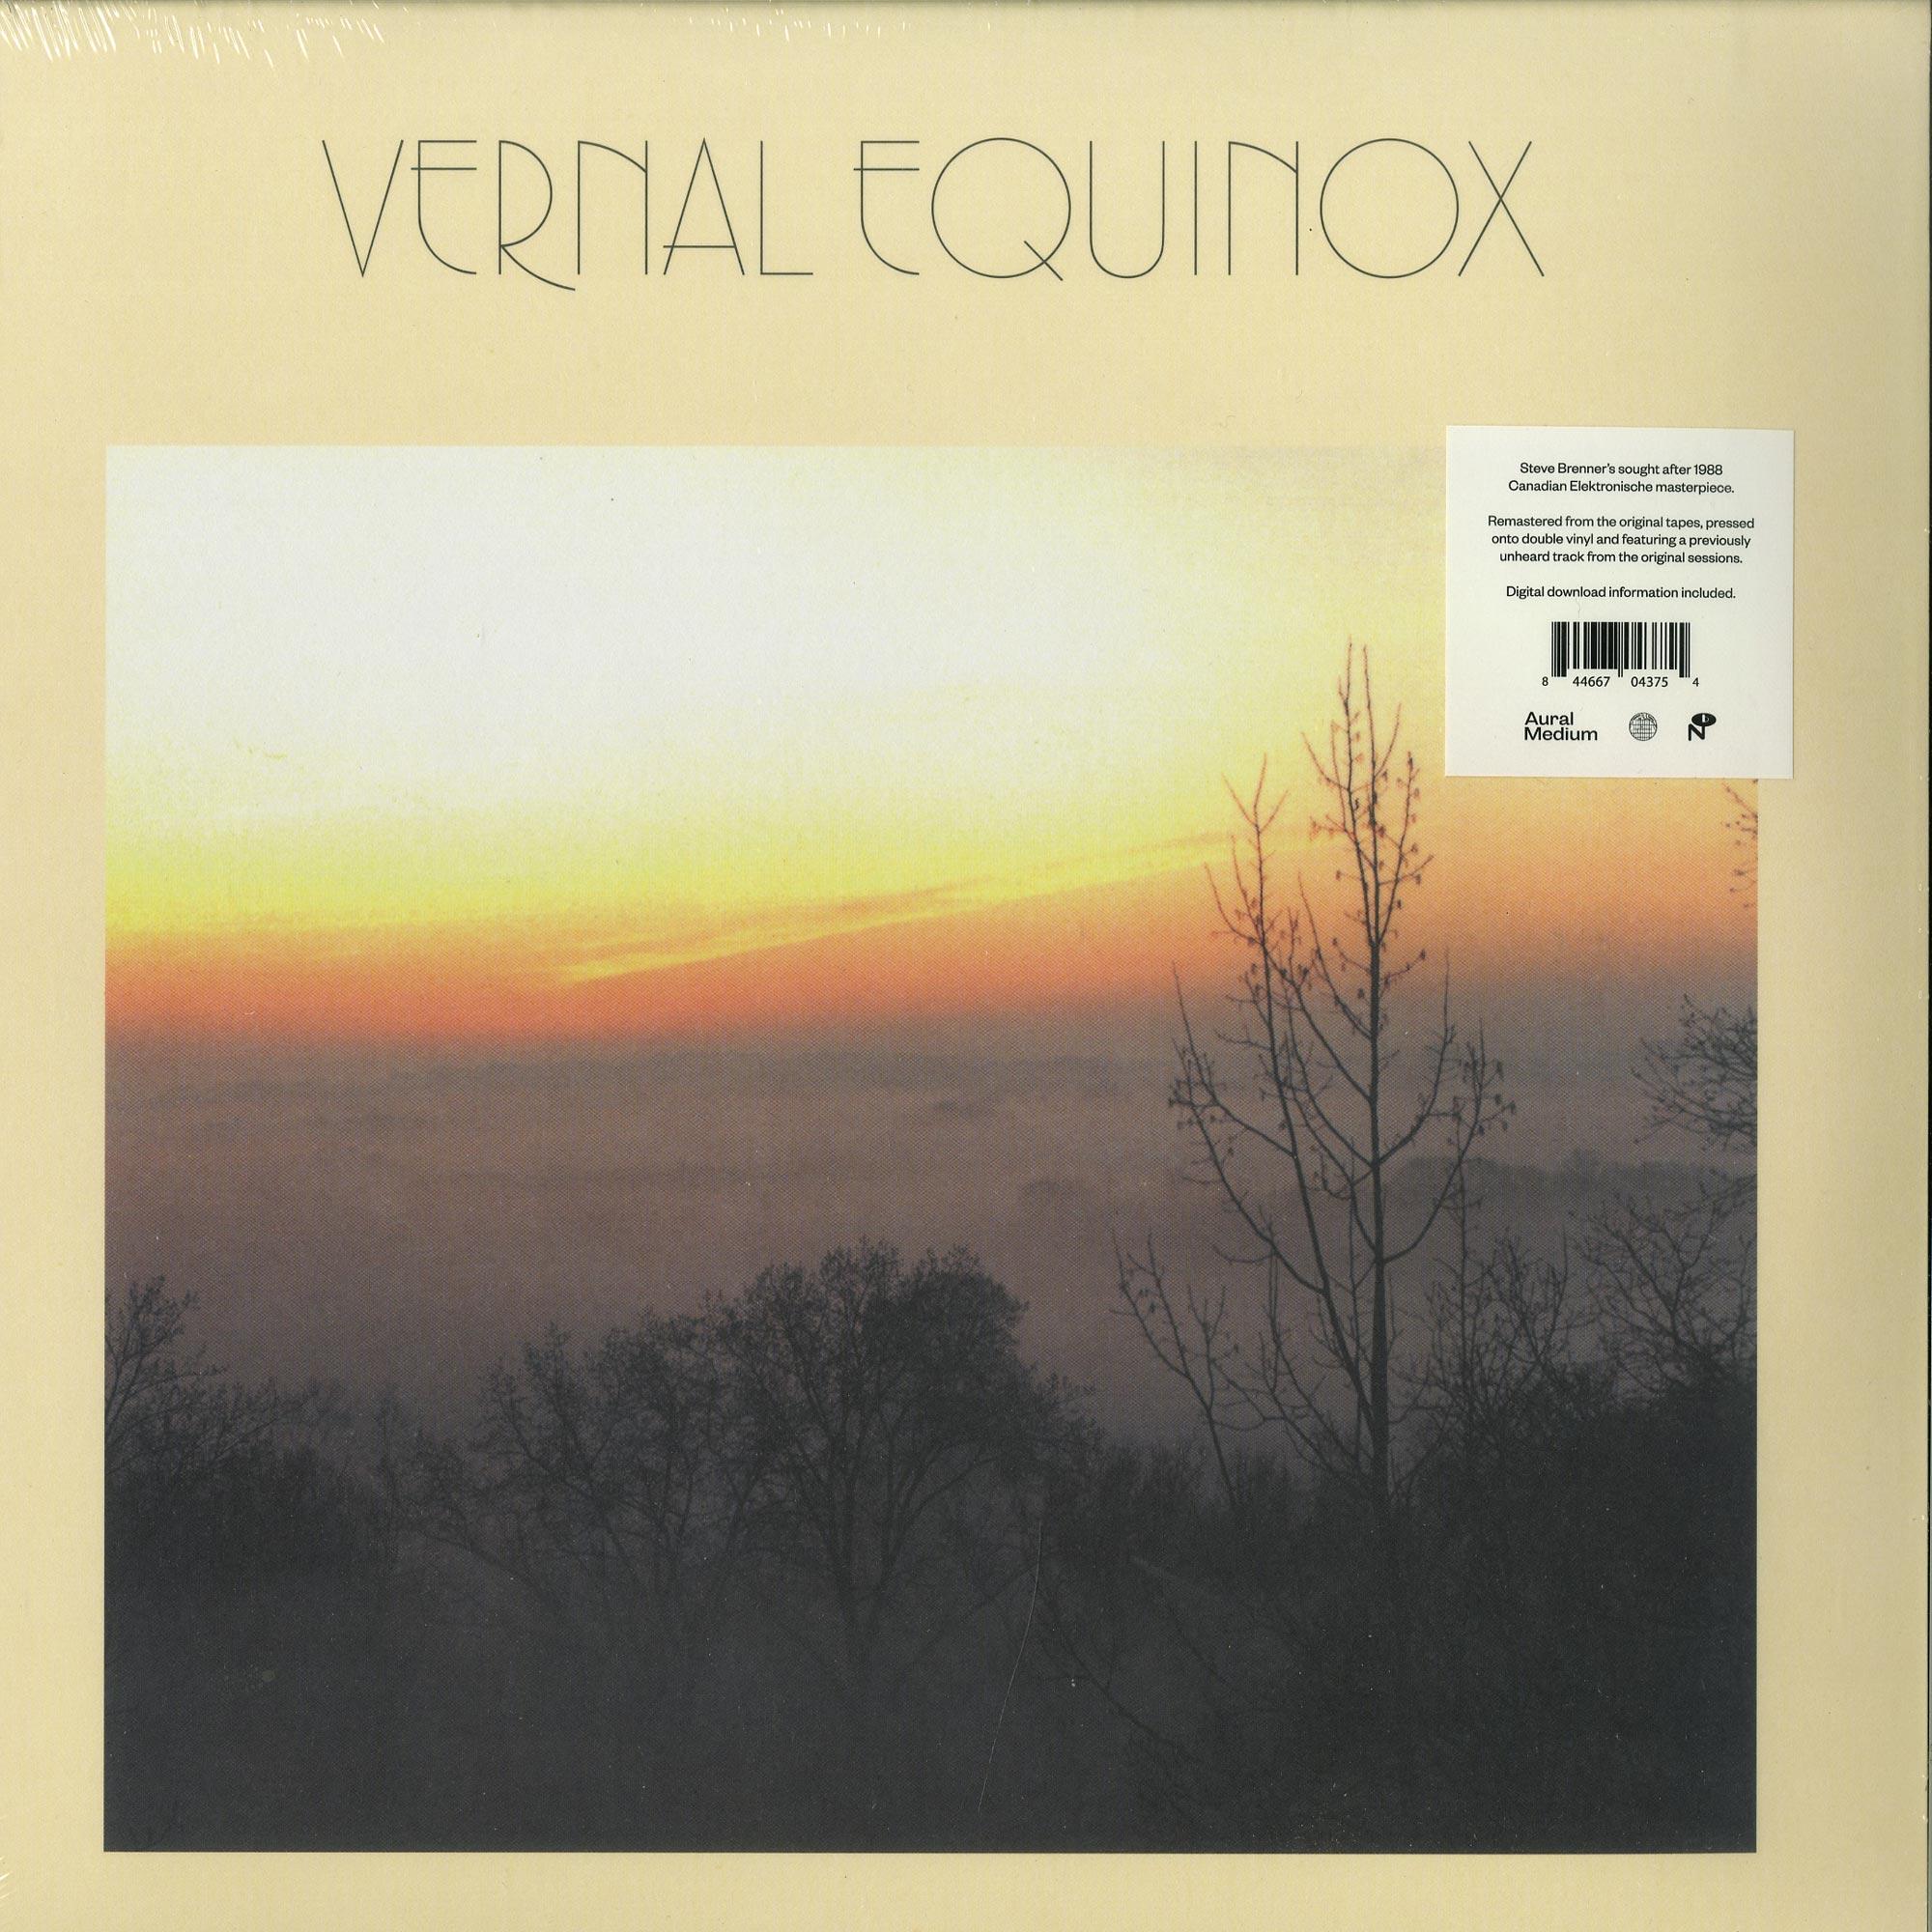 Vernal Equinox - NEW FOUND LOVE